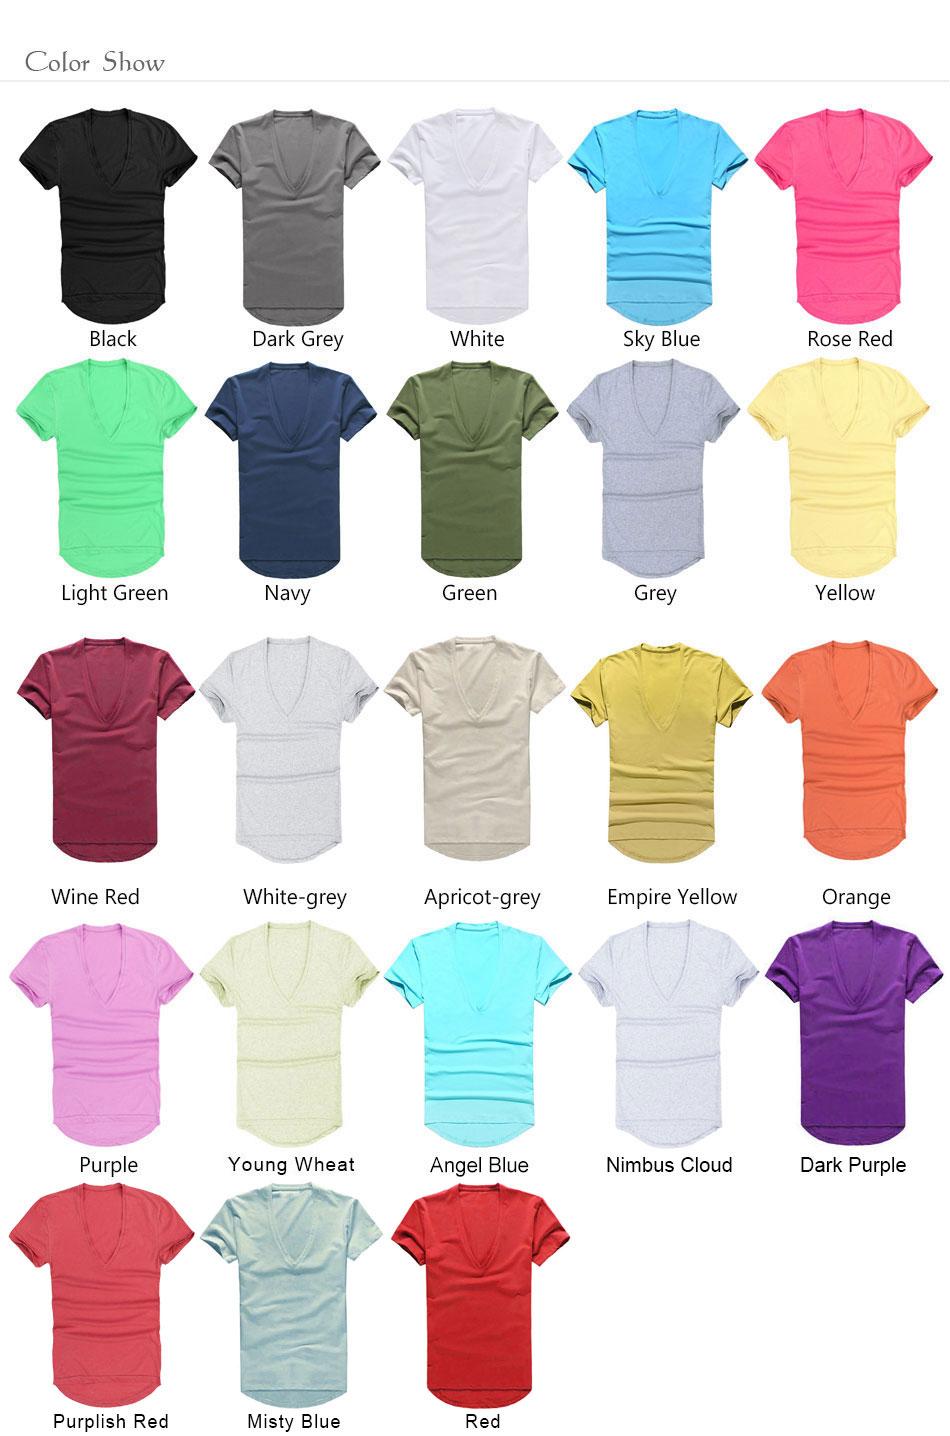 Zecmos Deep V Neck Sexy Men T-Shirt Vintage Short Sleeve Solid Color Muscle Fit T Shirt Men Top Tees Fashion 5